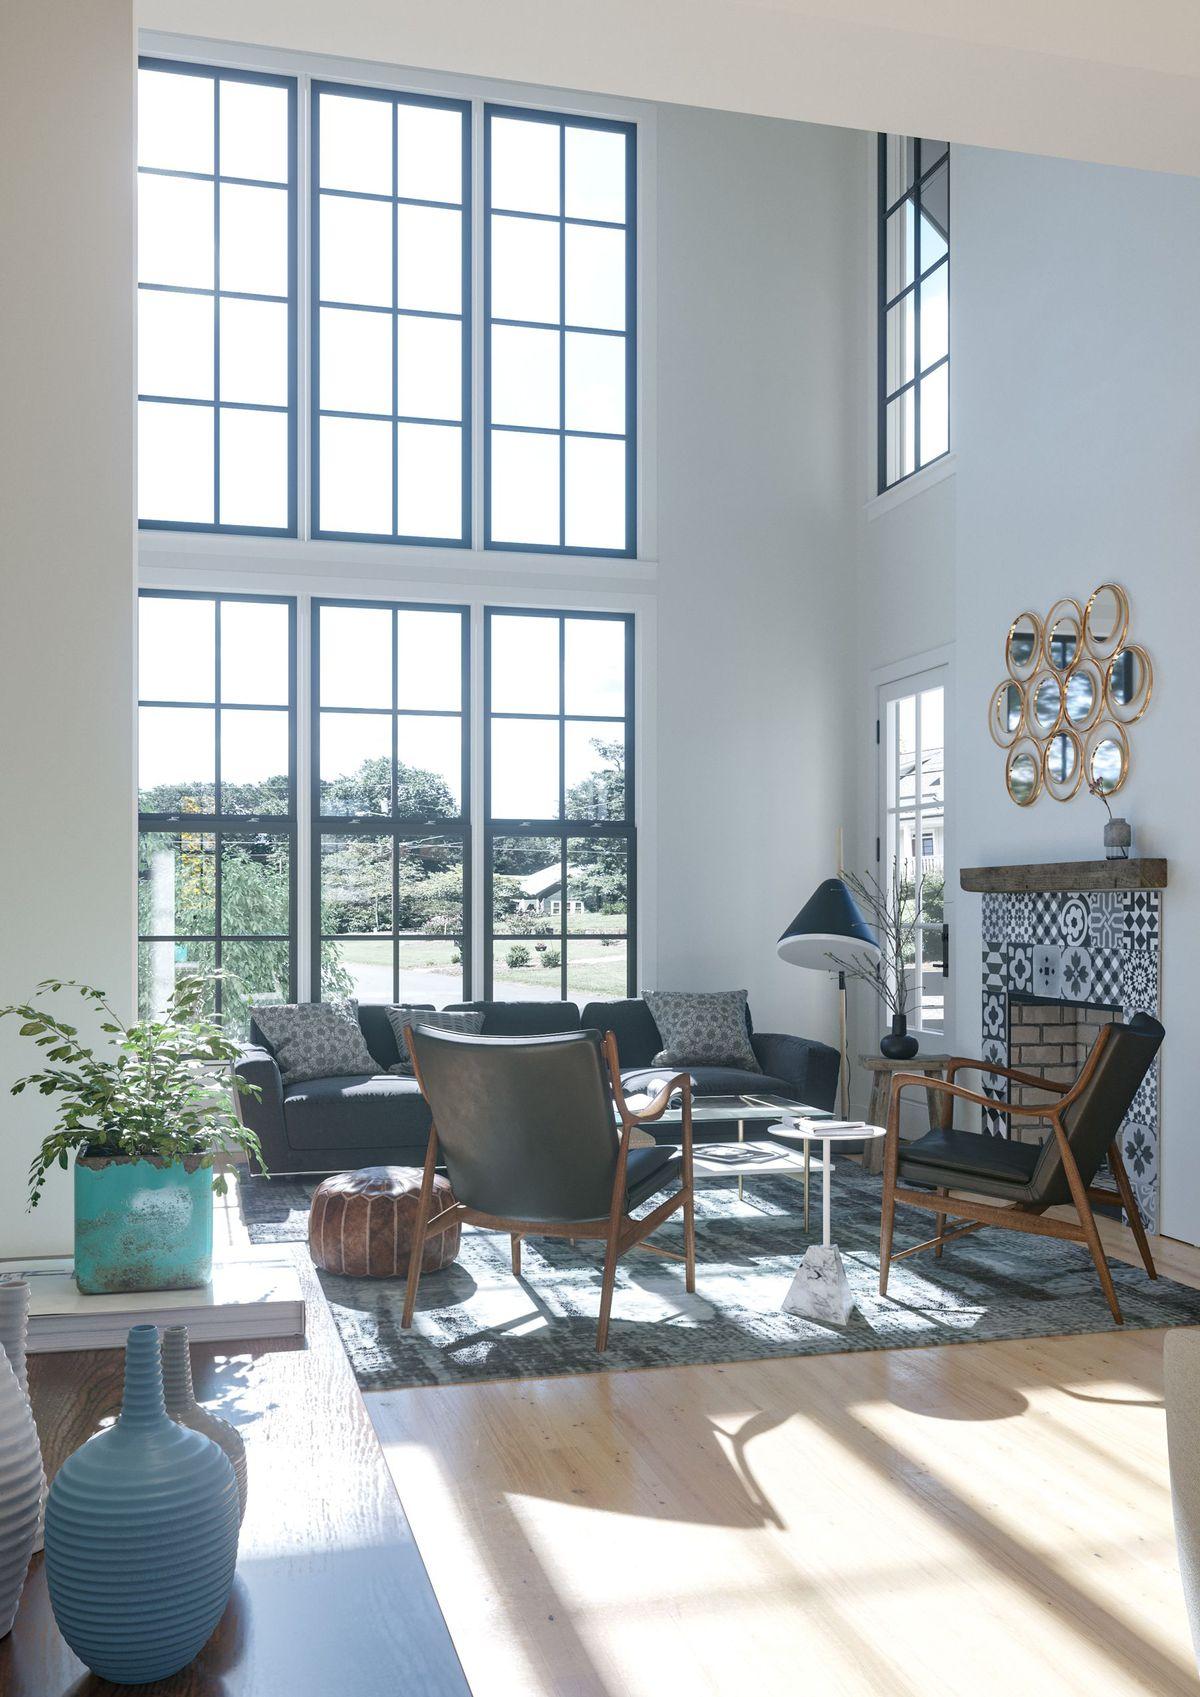 Huge windows in a living room.